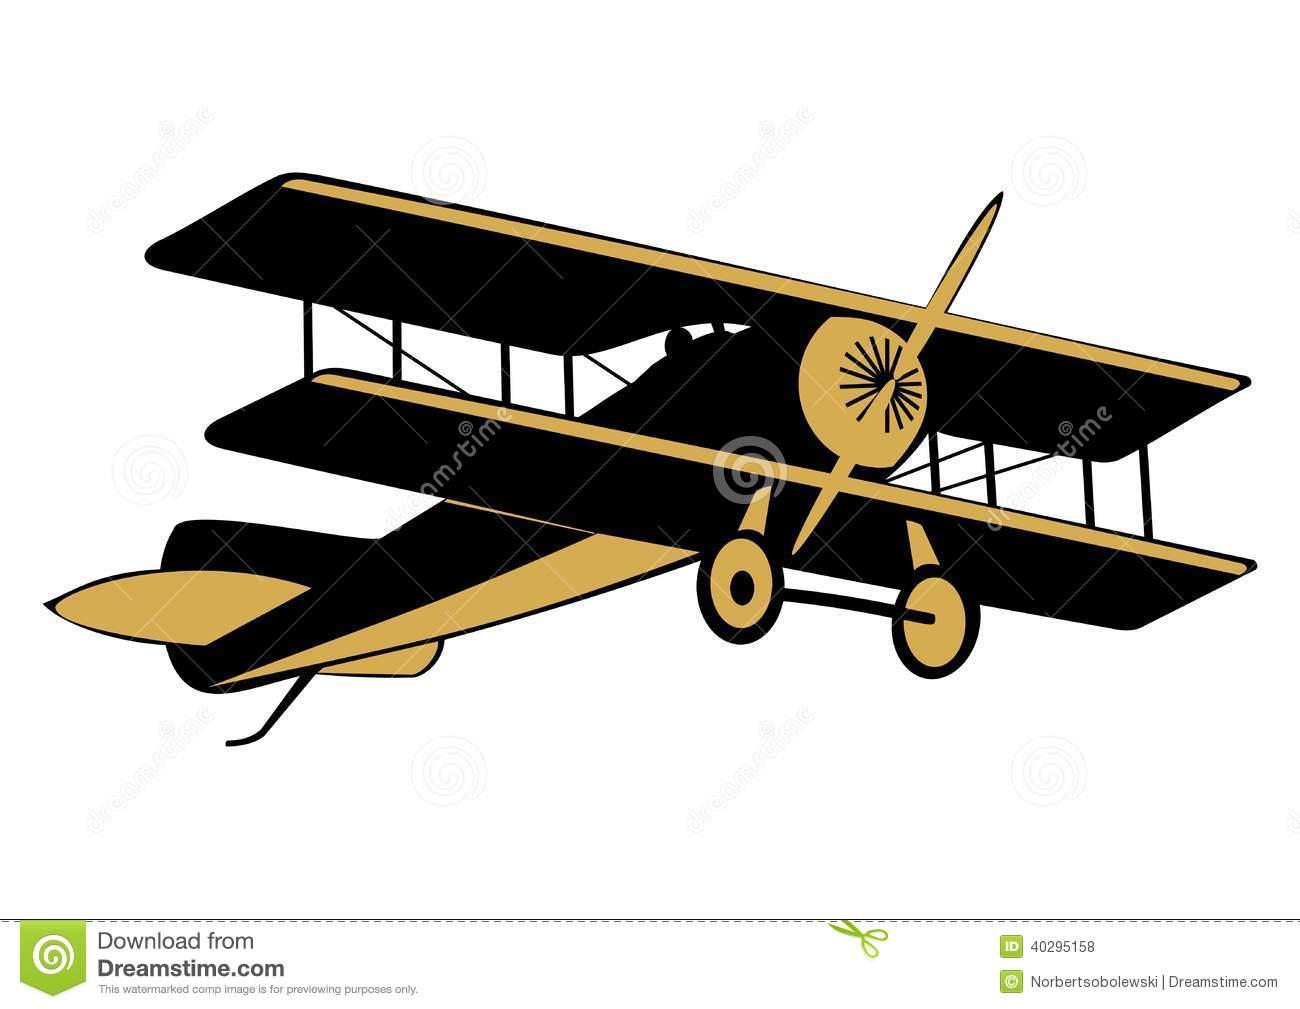 Clipart plane stock free jpg freeuse stock Airplane Stock Vector - Image: 40295158 jpg freeuse stock